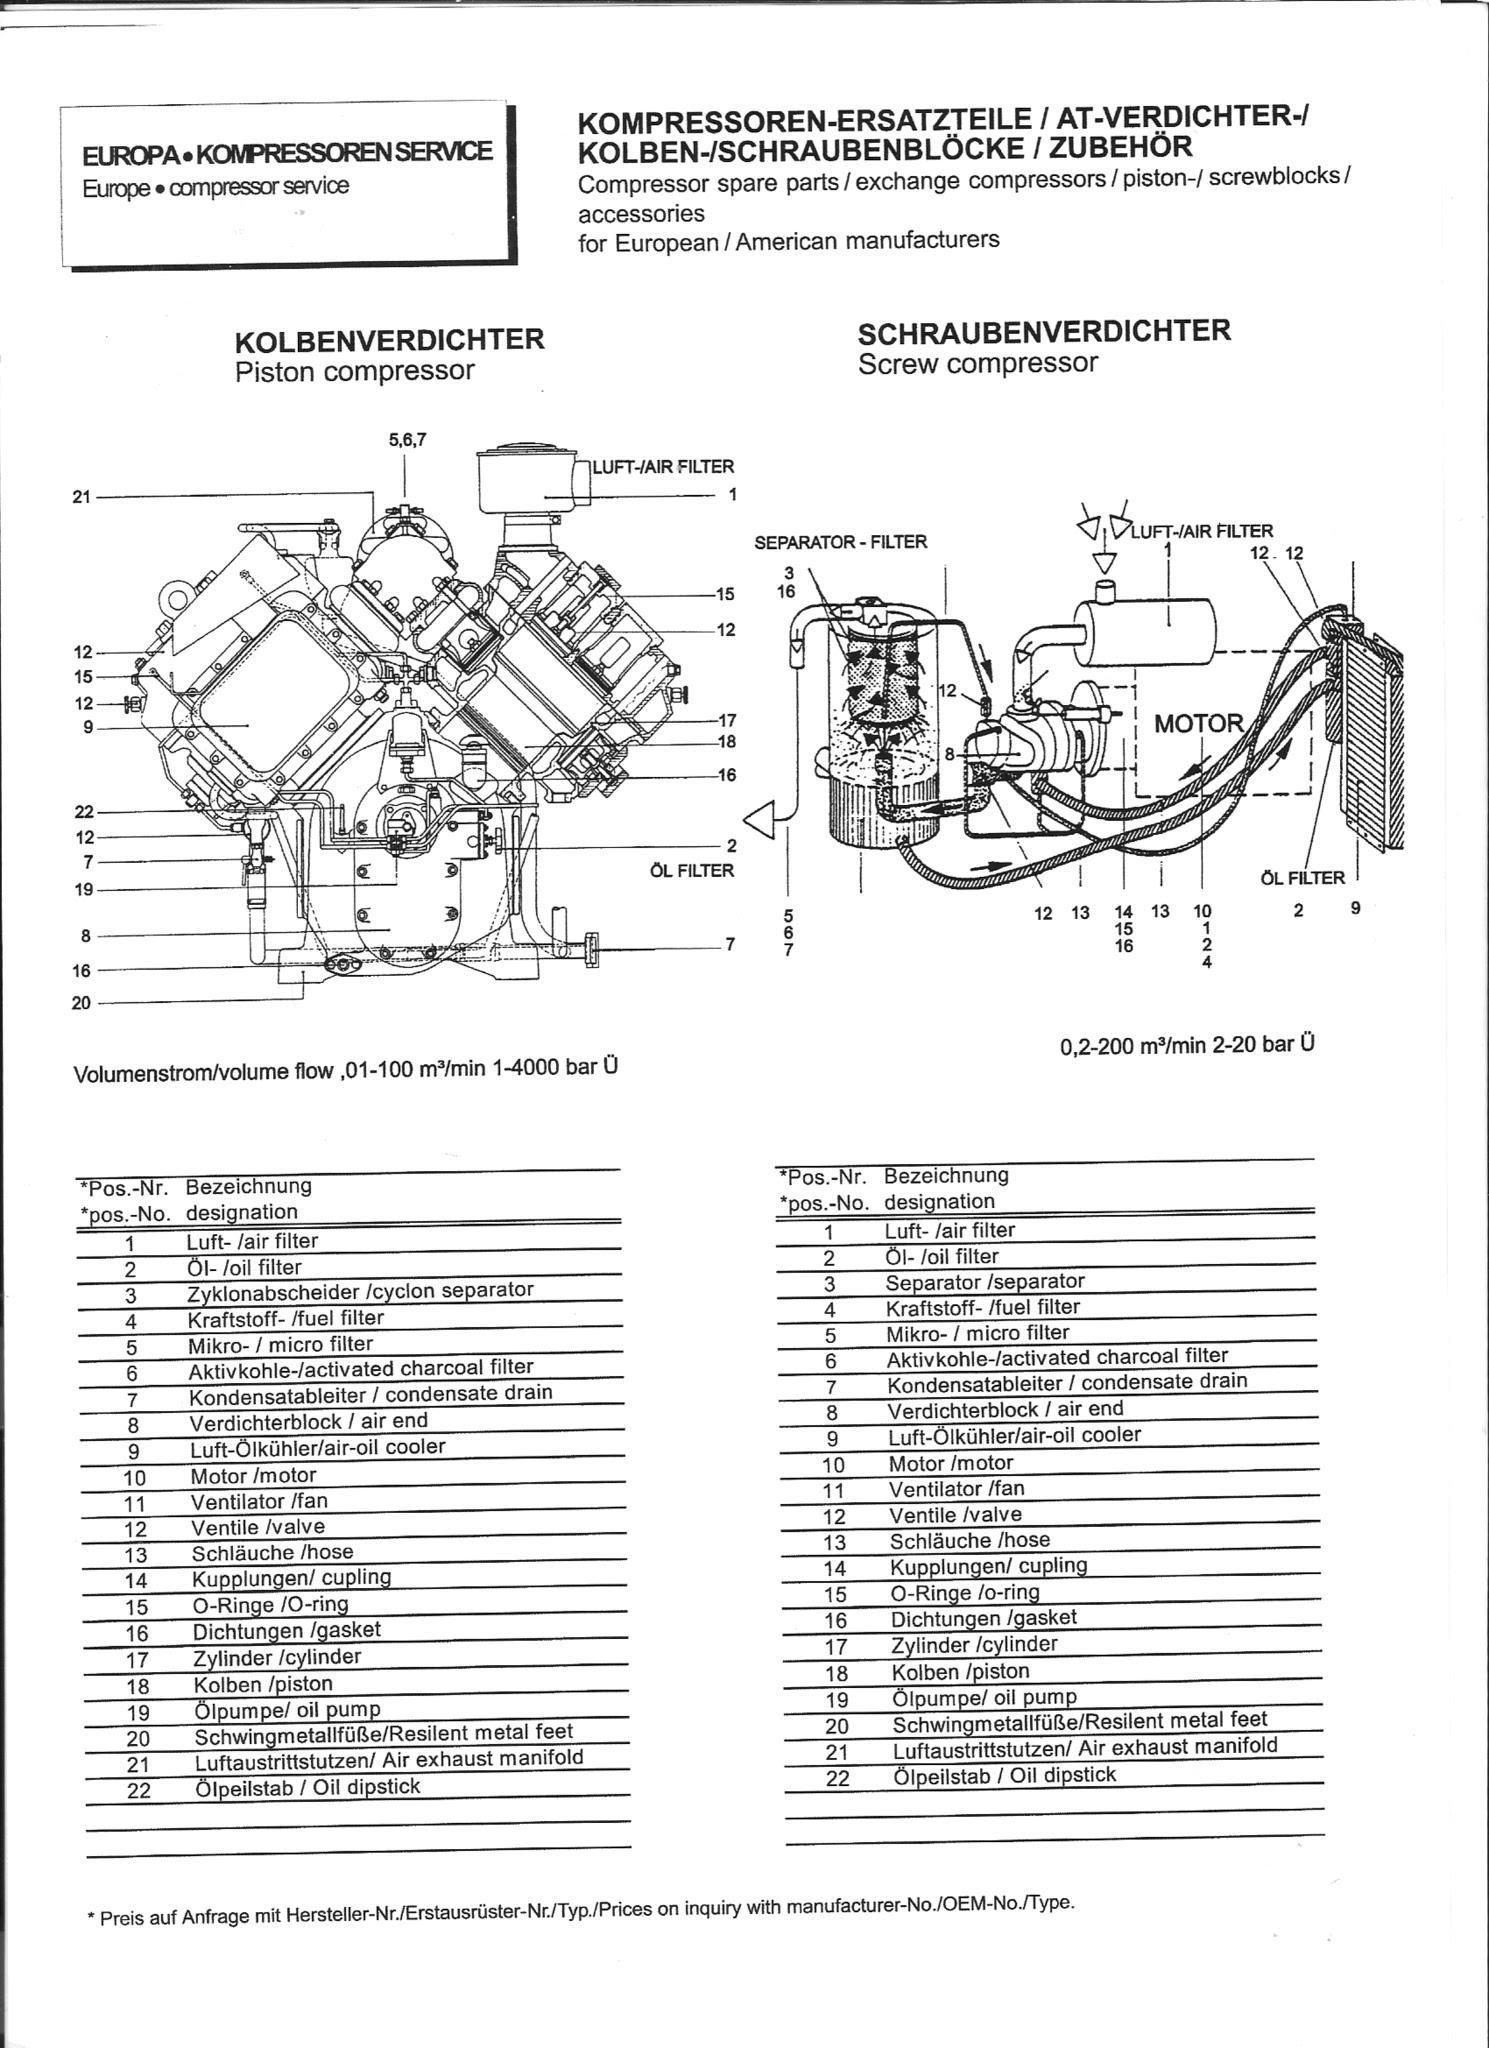 Erfreut Kompressor Schaltplan Ideen - Elektrische Schaltplan-Ideen ...